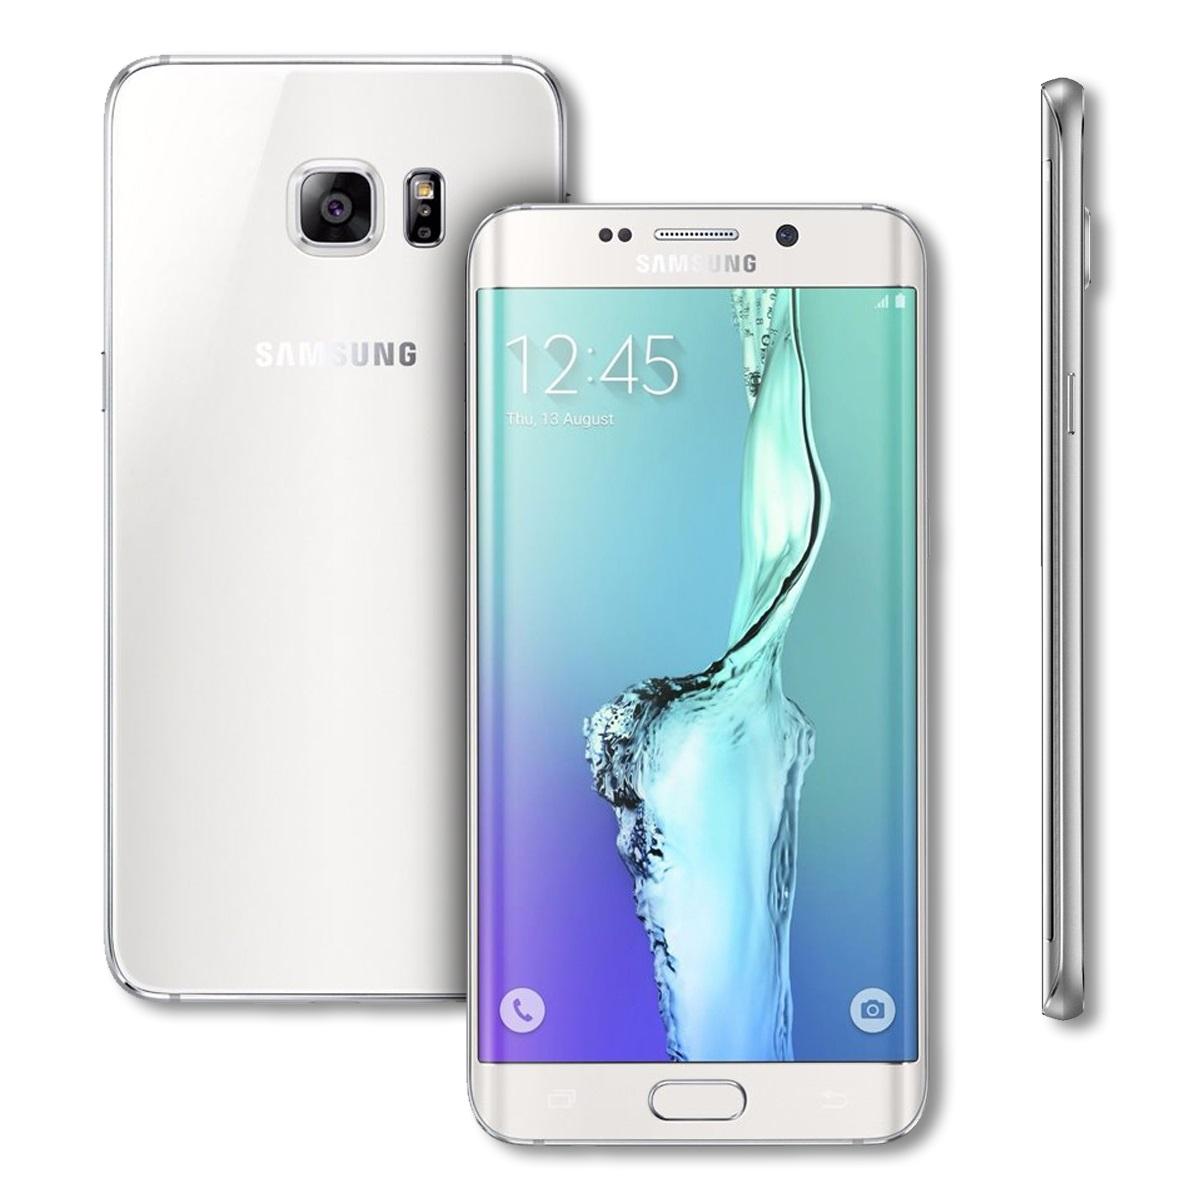 Samsung Galaxy S6 Edge Plus Sm G928v Smartphone Verizon 4g